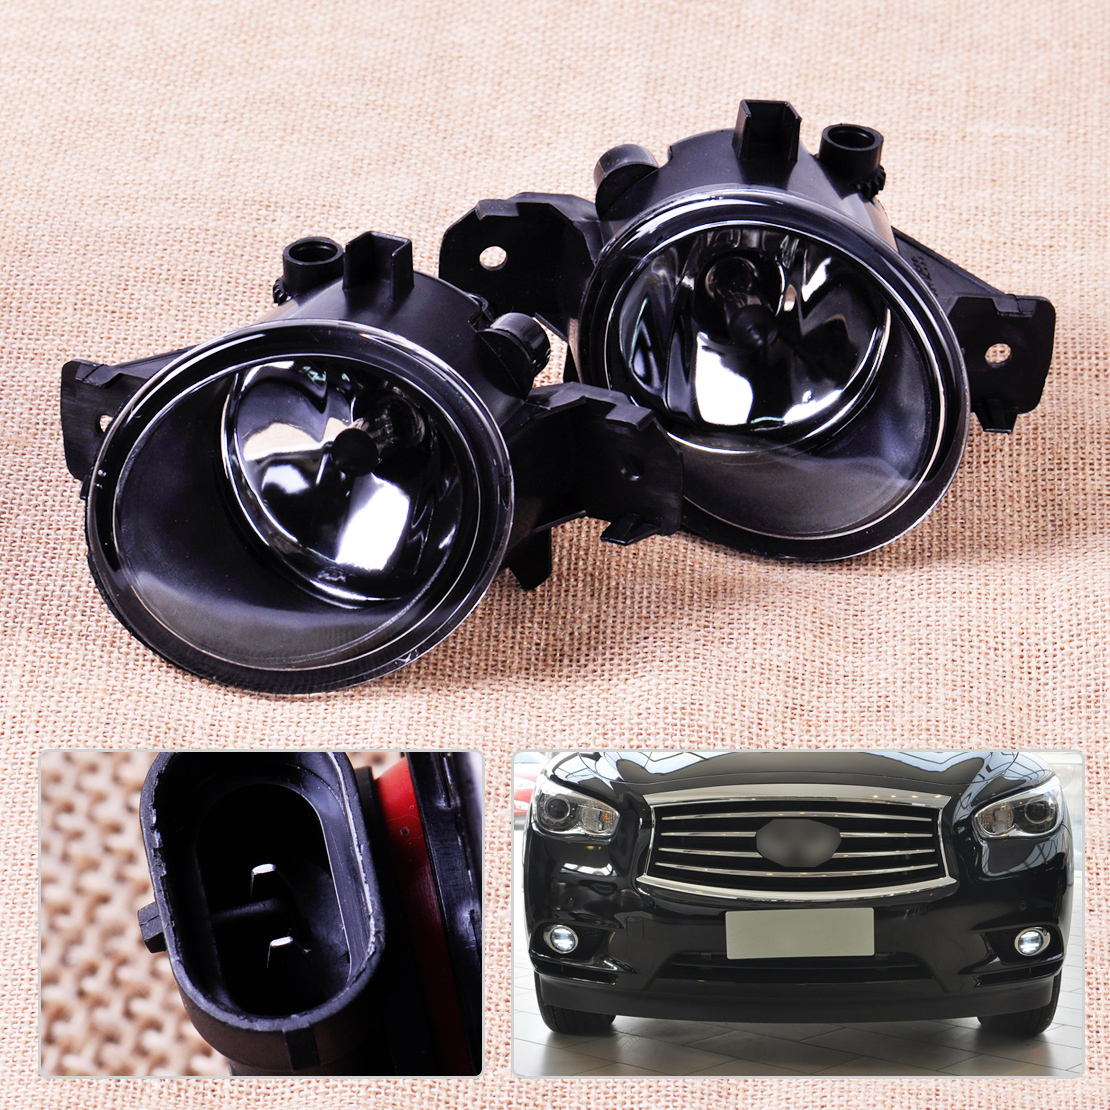 Infiniti qx60 rubber floor mats - 1pair Fog Light Lamp H11 Halogen Bulb Len Fit For Nissan Altima Infiniti Qx60 M35